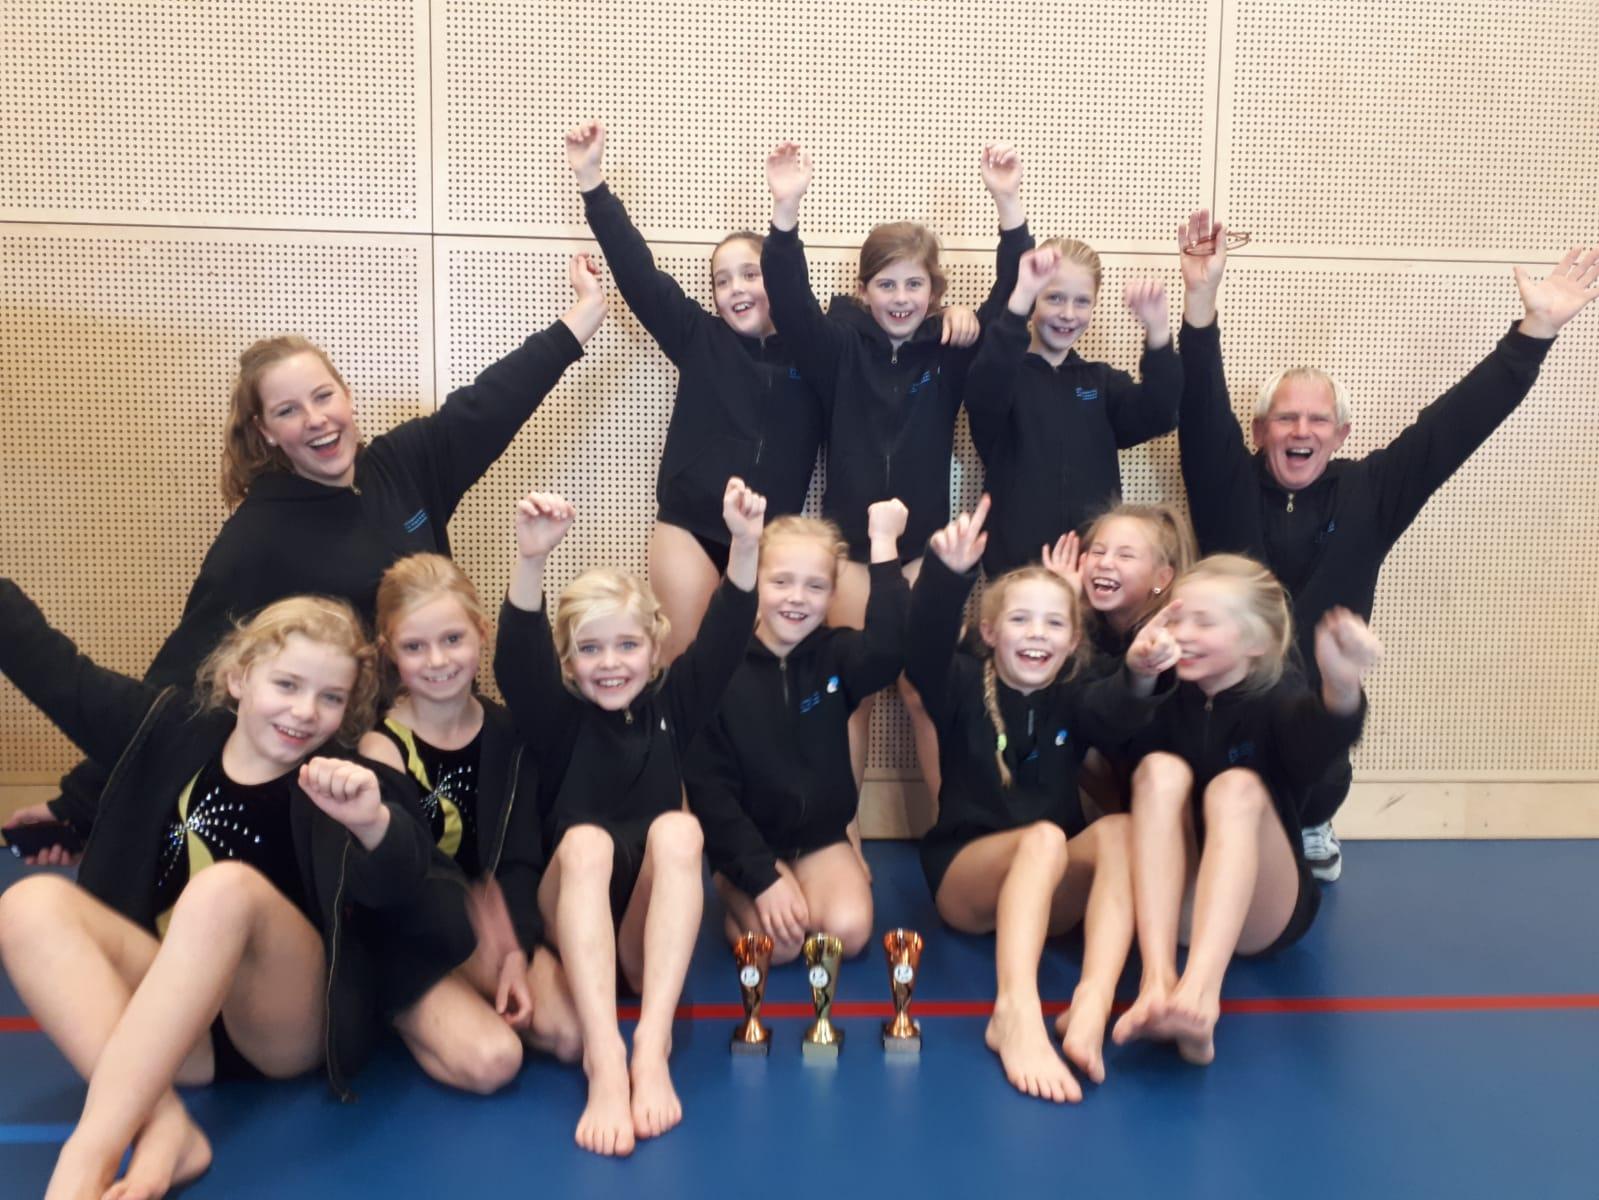 Springgroep jeugd 27-10-2018 Steenwijk